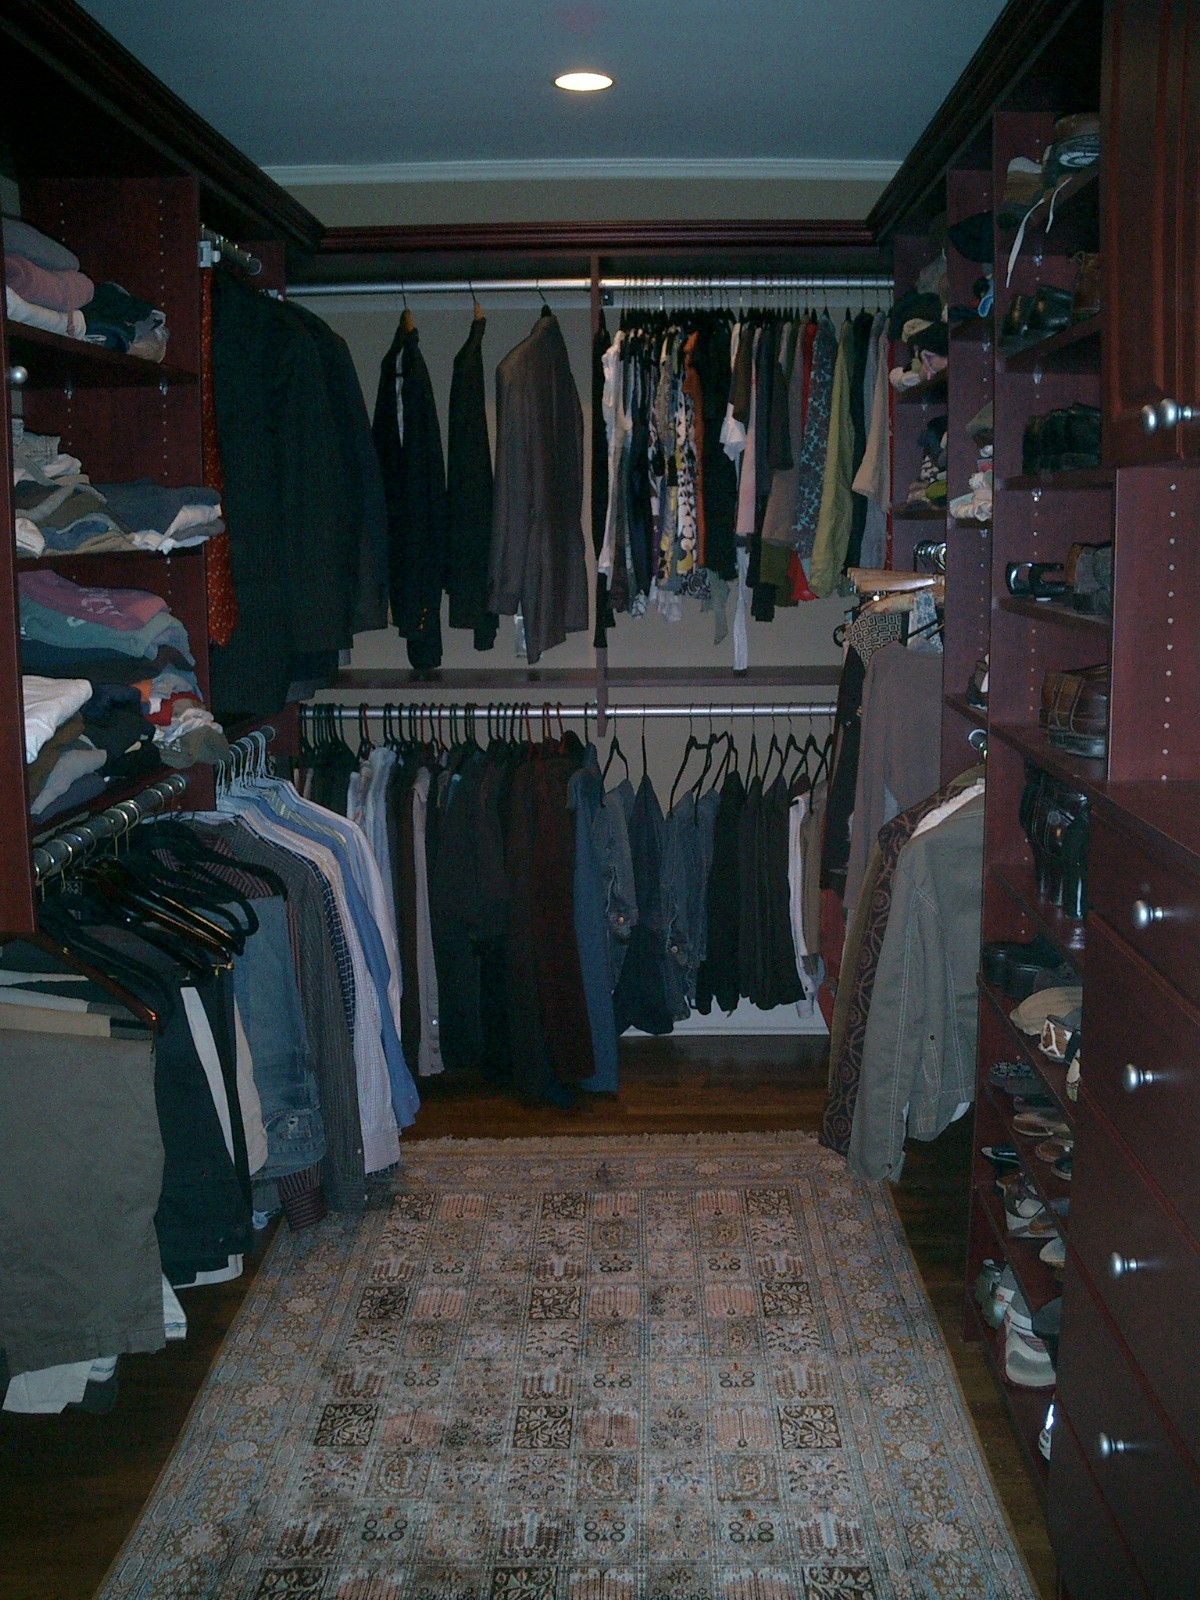 Custom Designed Through Ridgewood Closets Of New Jersey  (www.ridgewoodclosets.com) ...